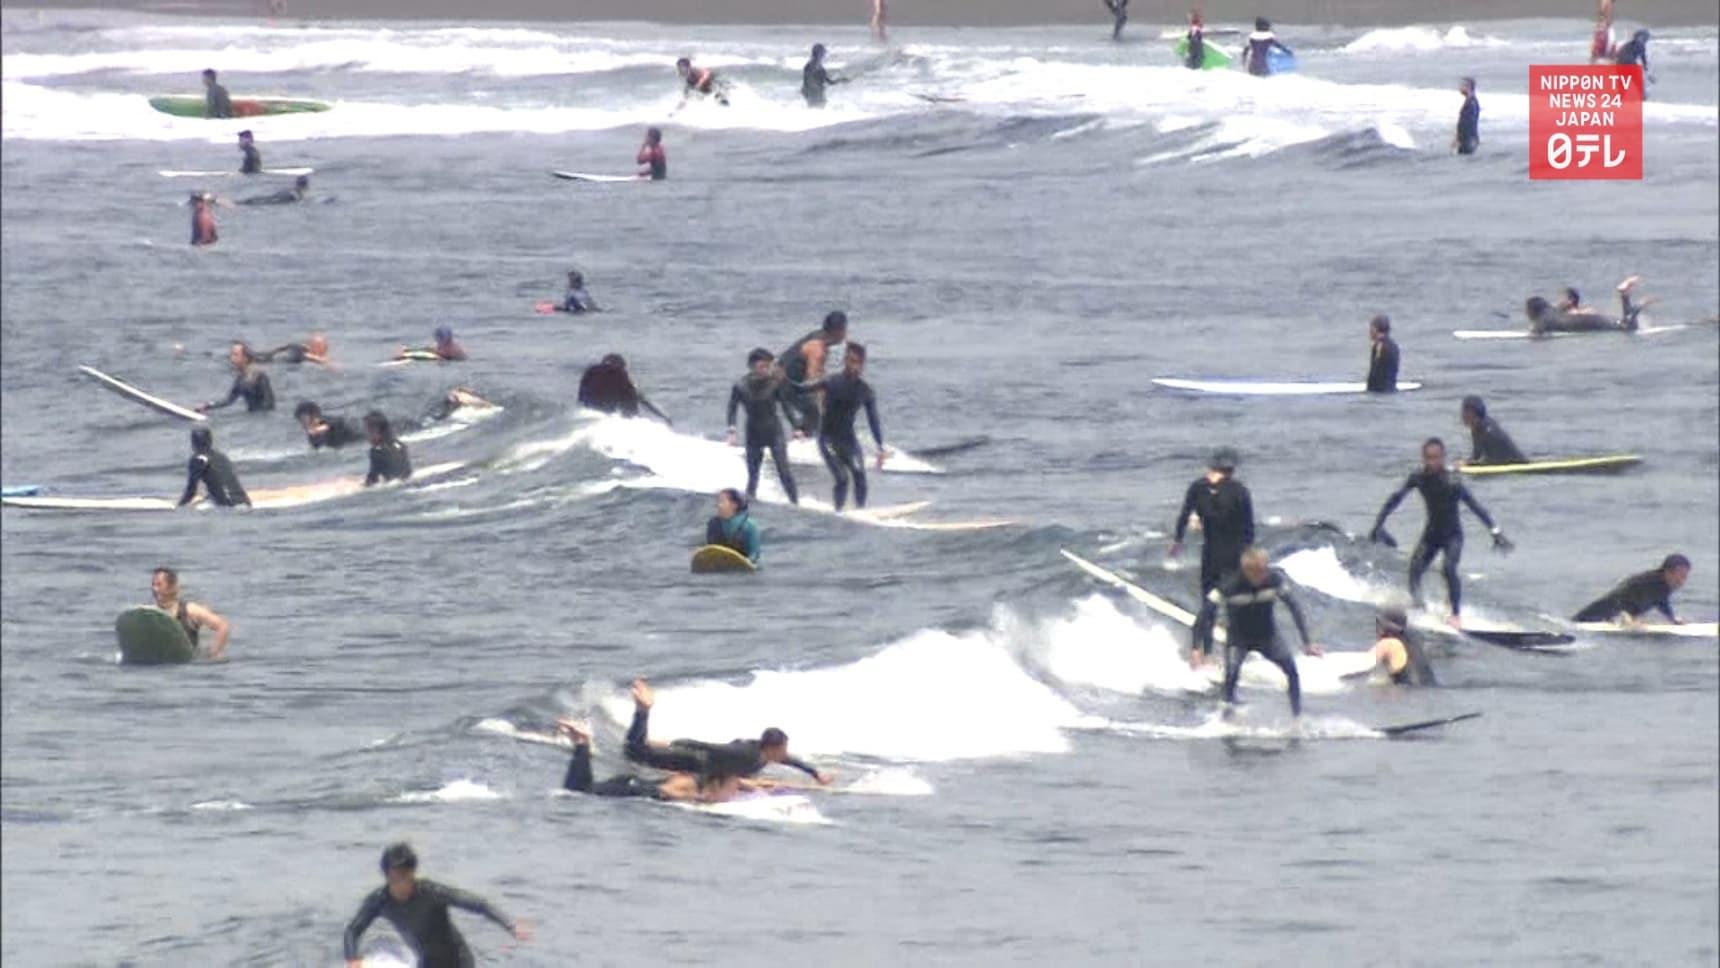 Kanagawa Beaches Reopen to Visitors